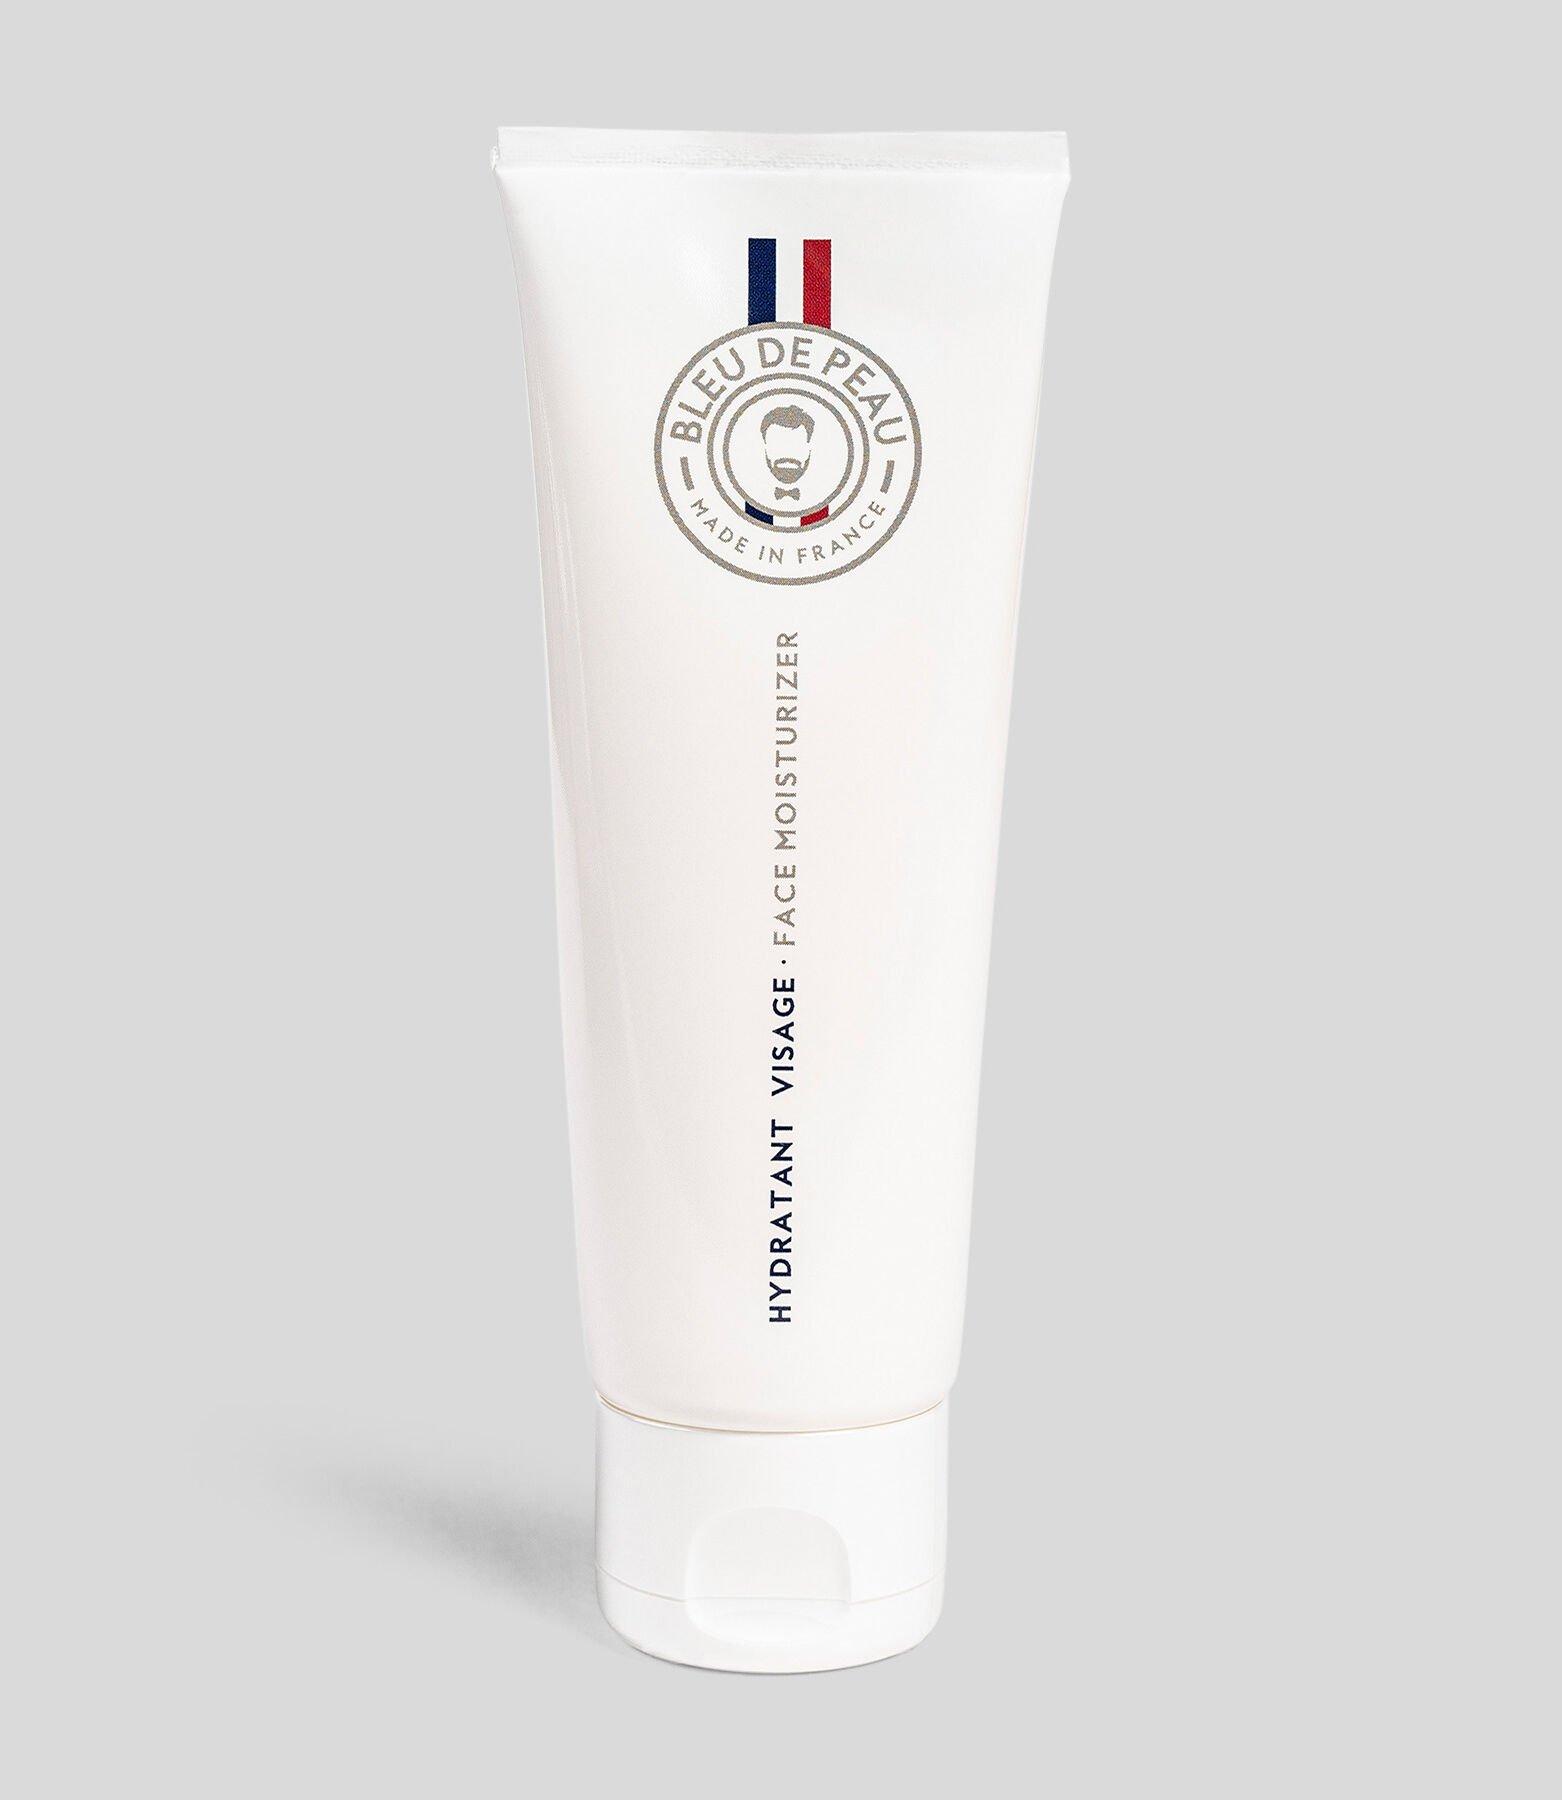 Kit de voyage soin barbe Bleu de peau